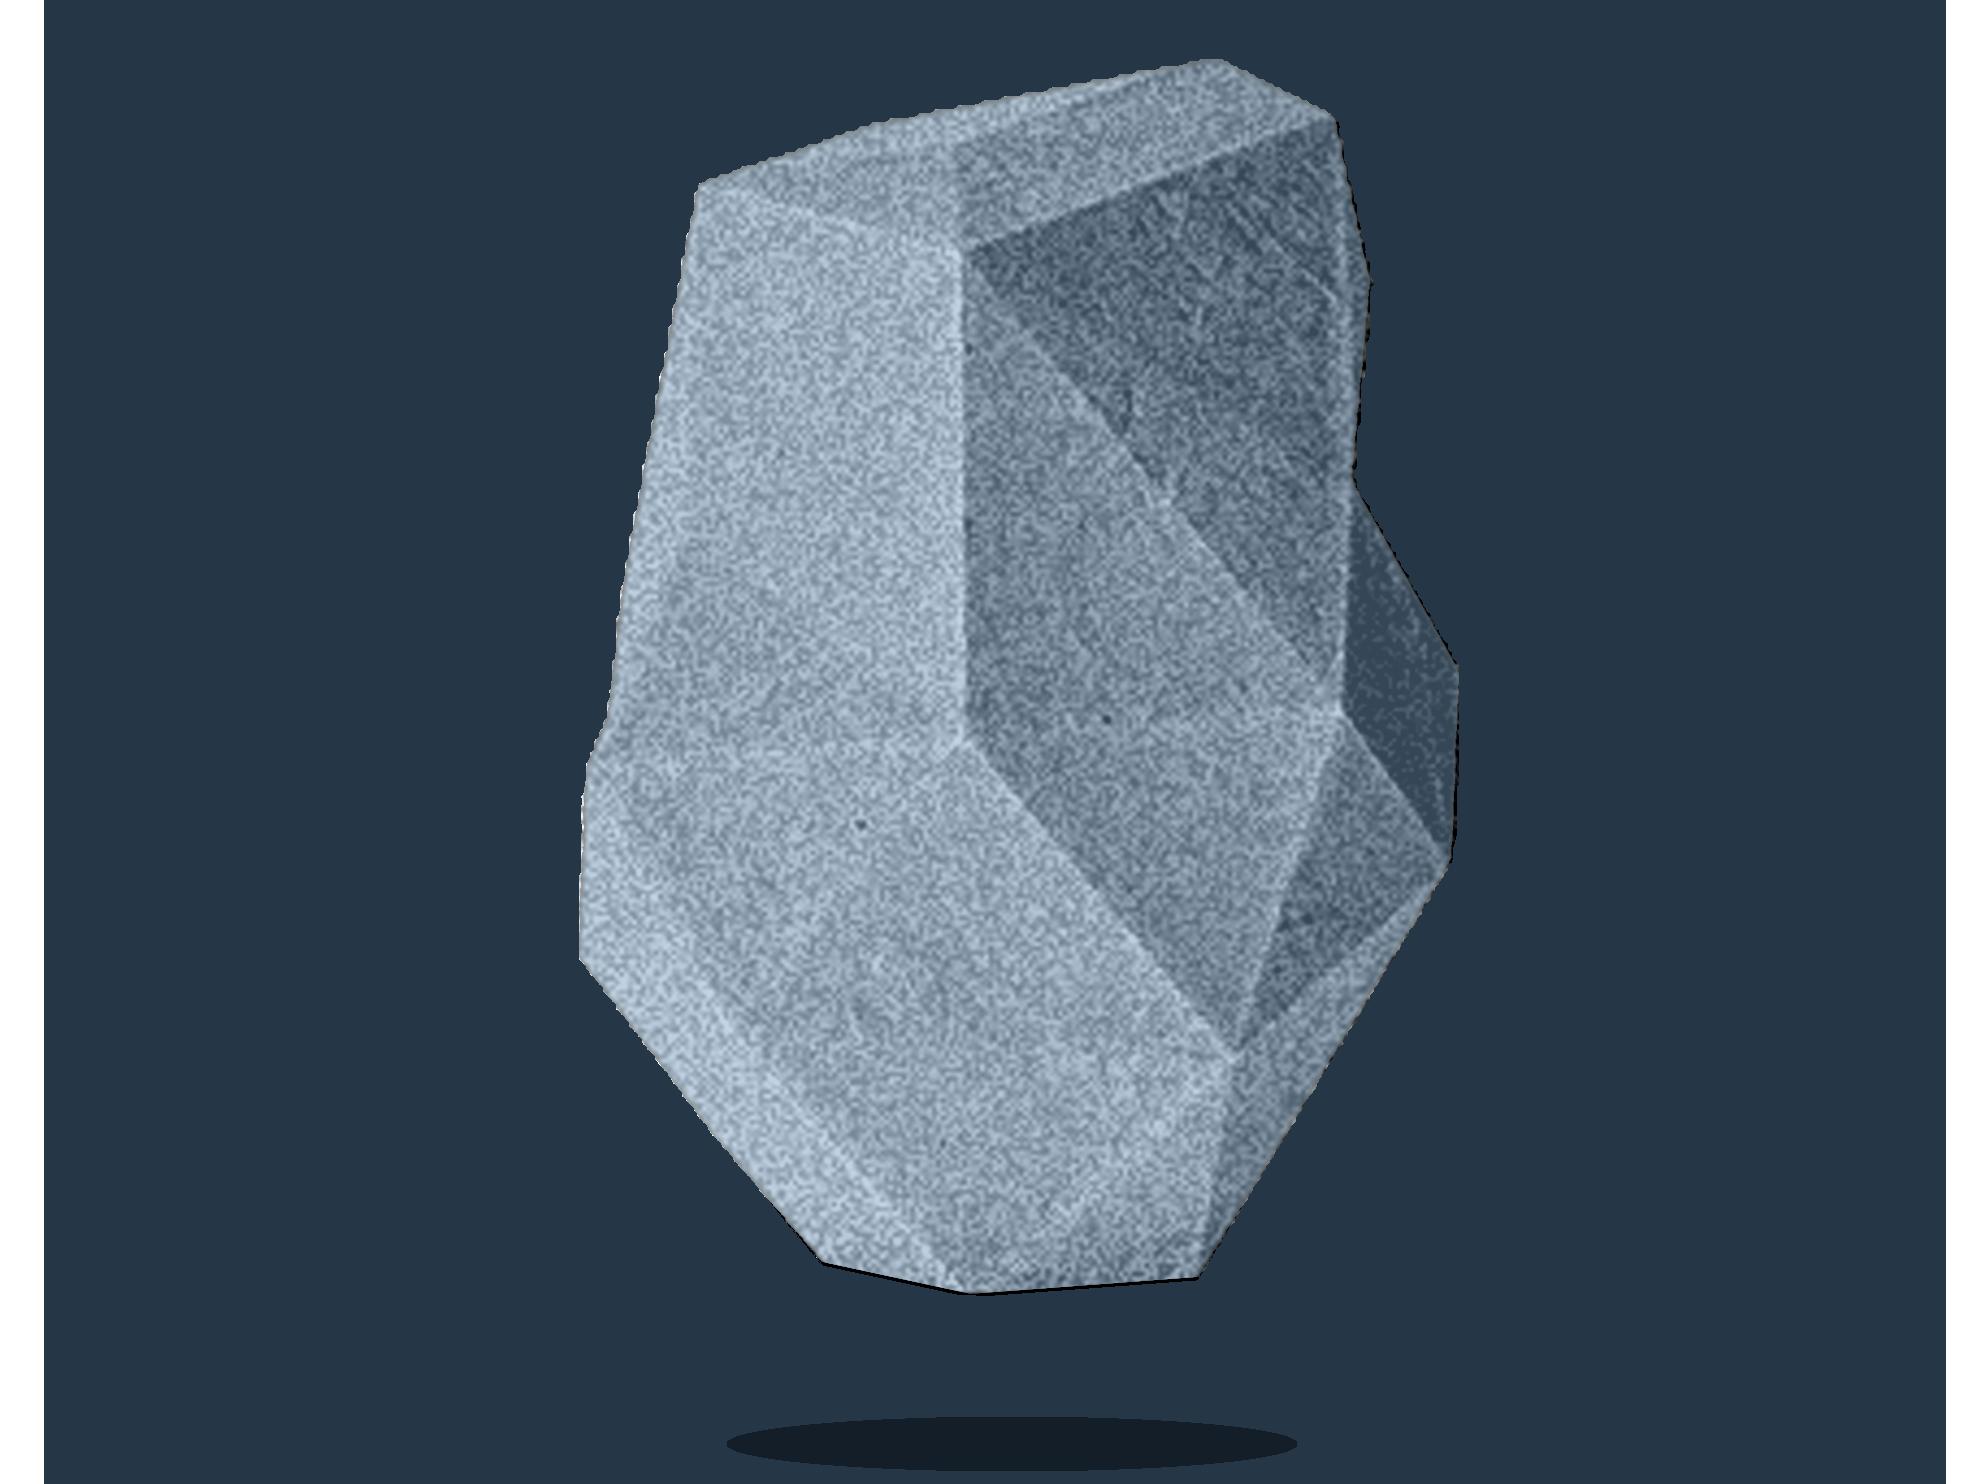 rock_illust_4.png